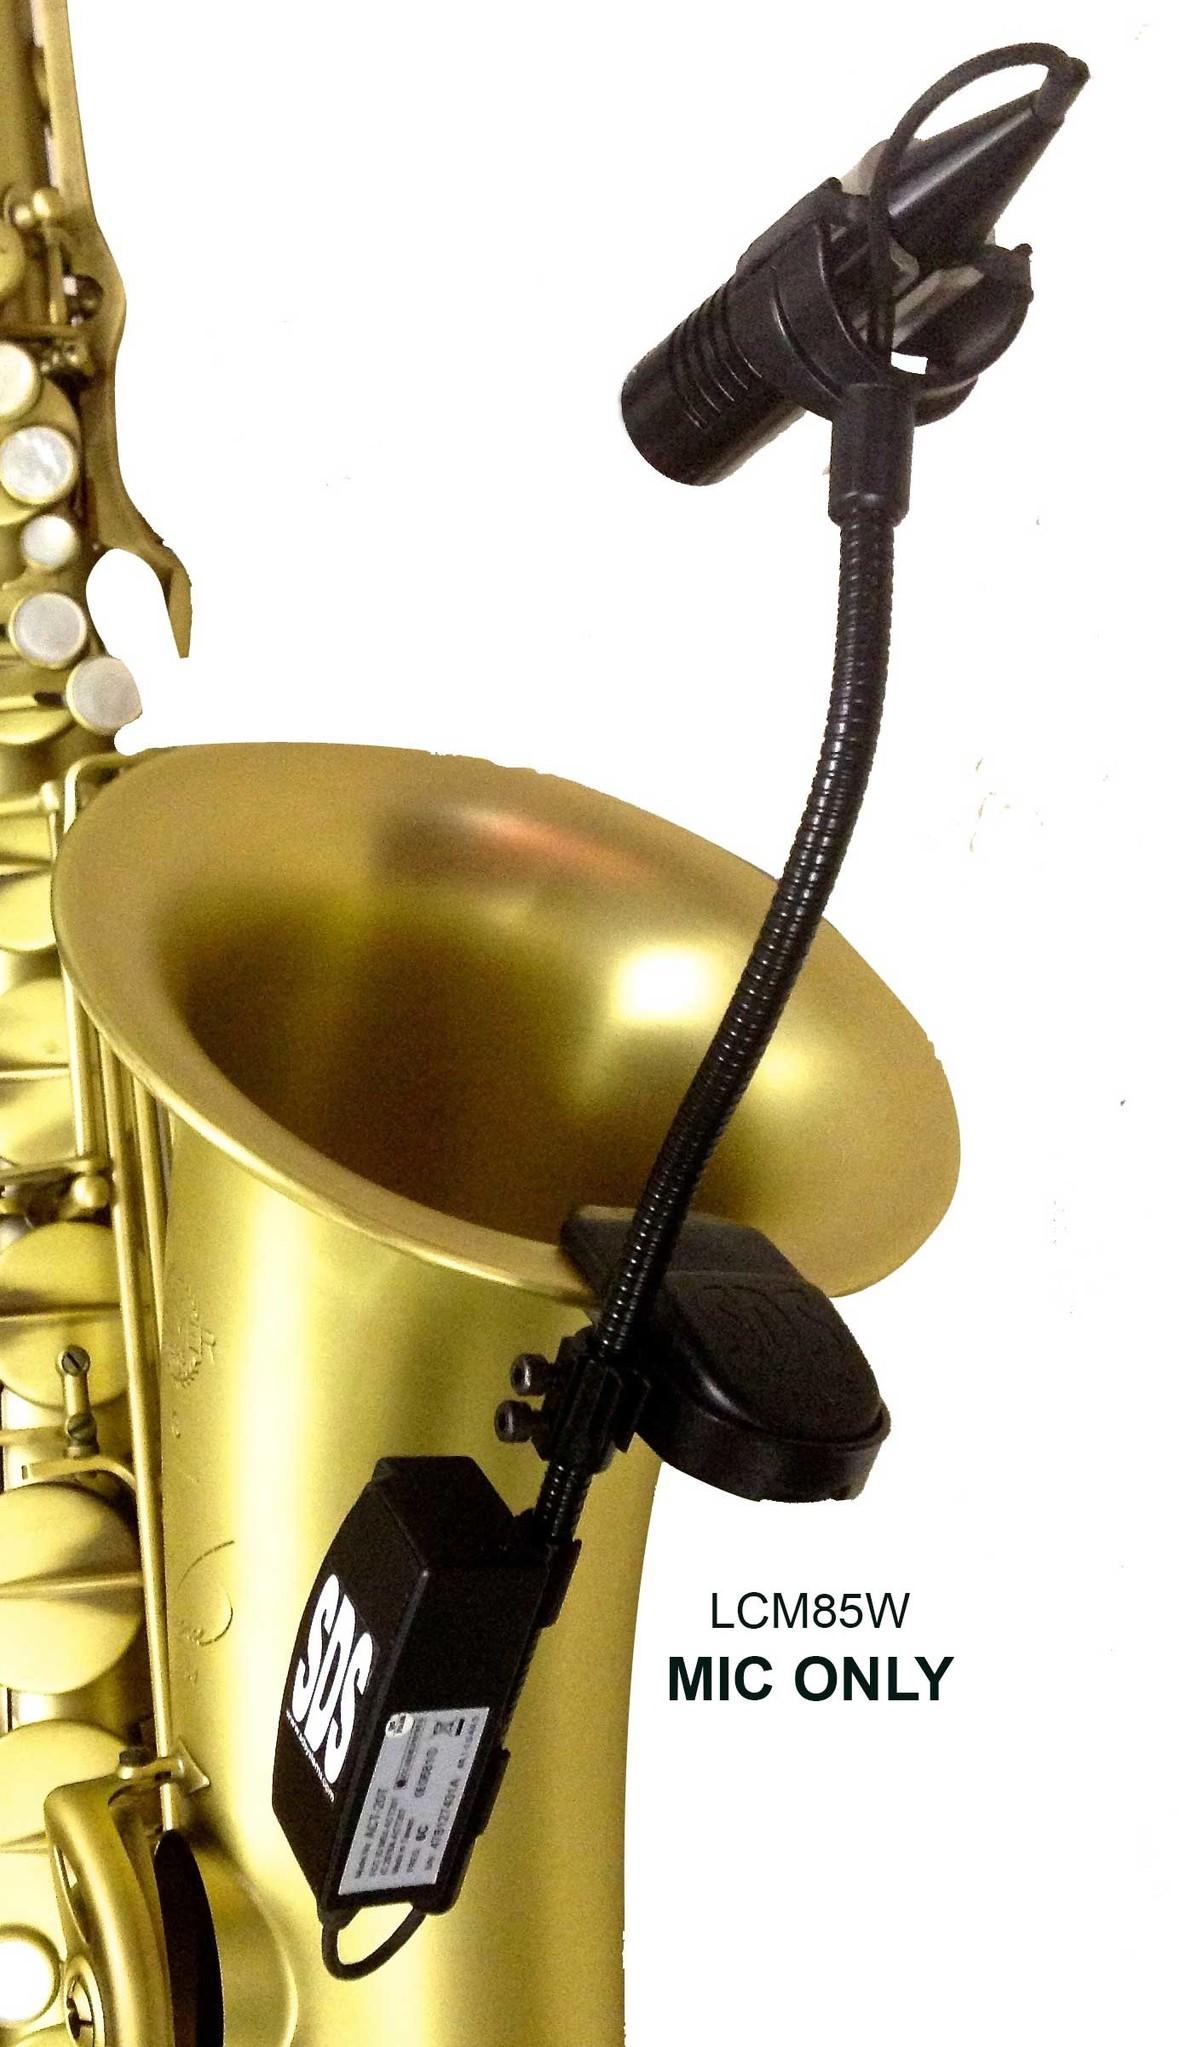 LCM85W mic ONLY